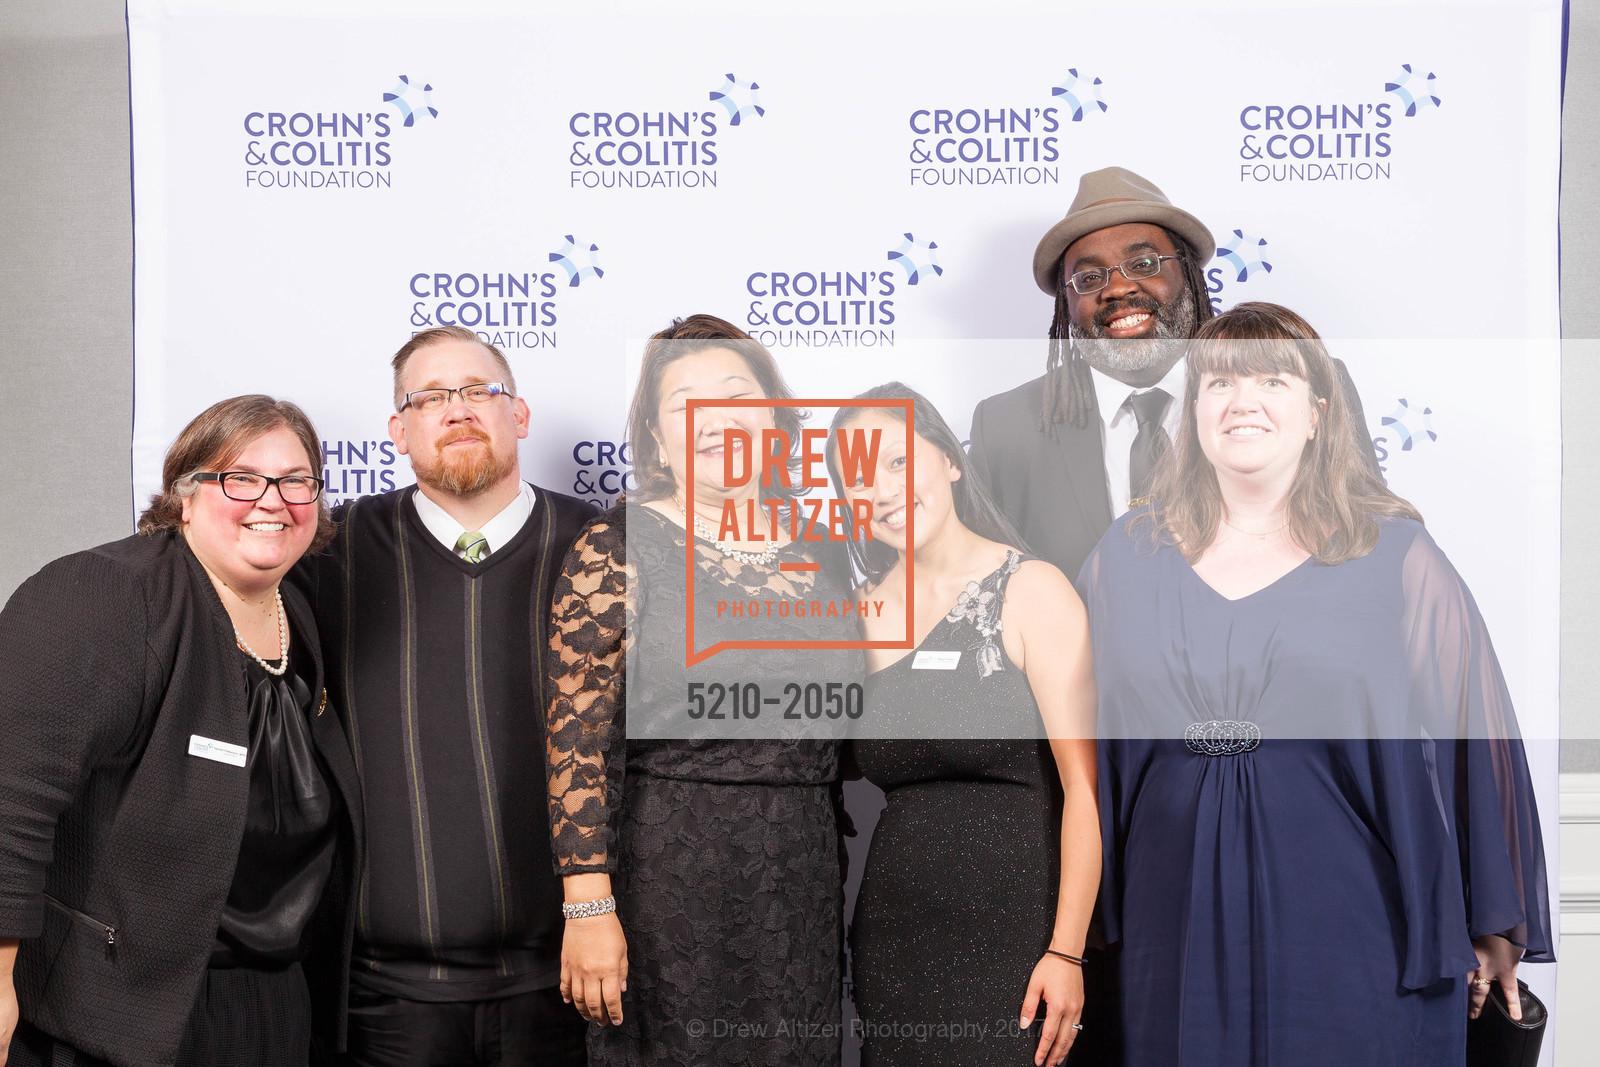 Harriet Patterson, Jeremy Morioka, Kristi Morioka, Megan Franks, Rodney Blackwell, Cathy Blackwell, Photo #5210-2050